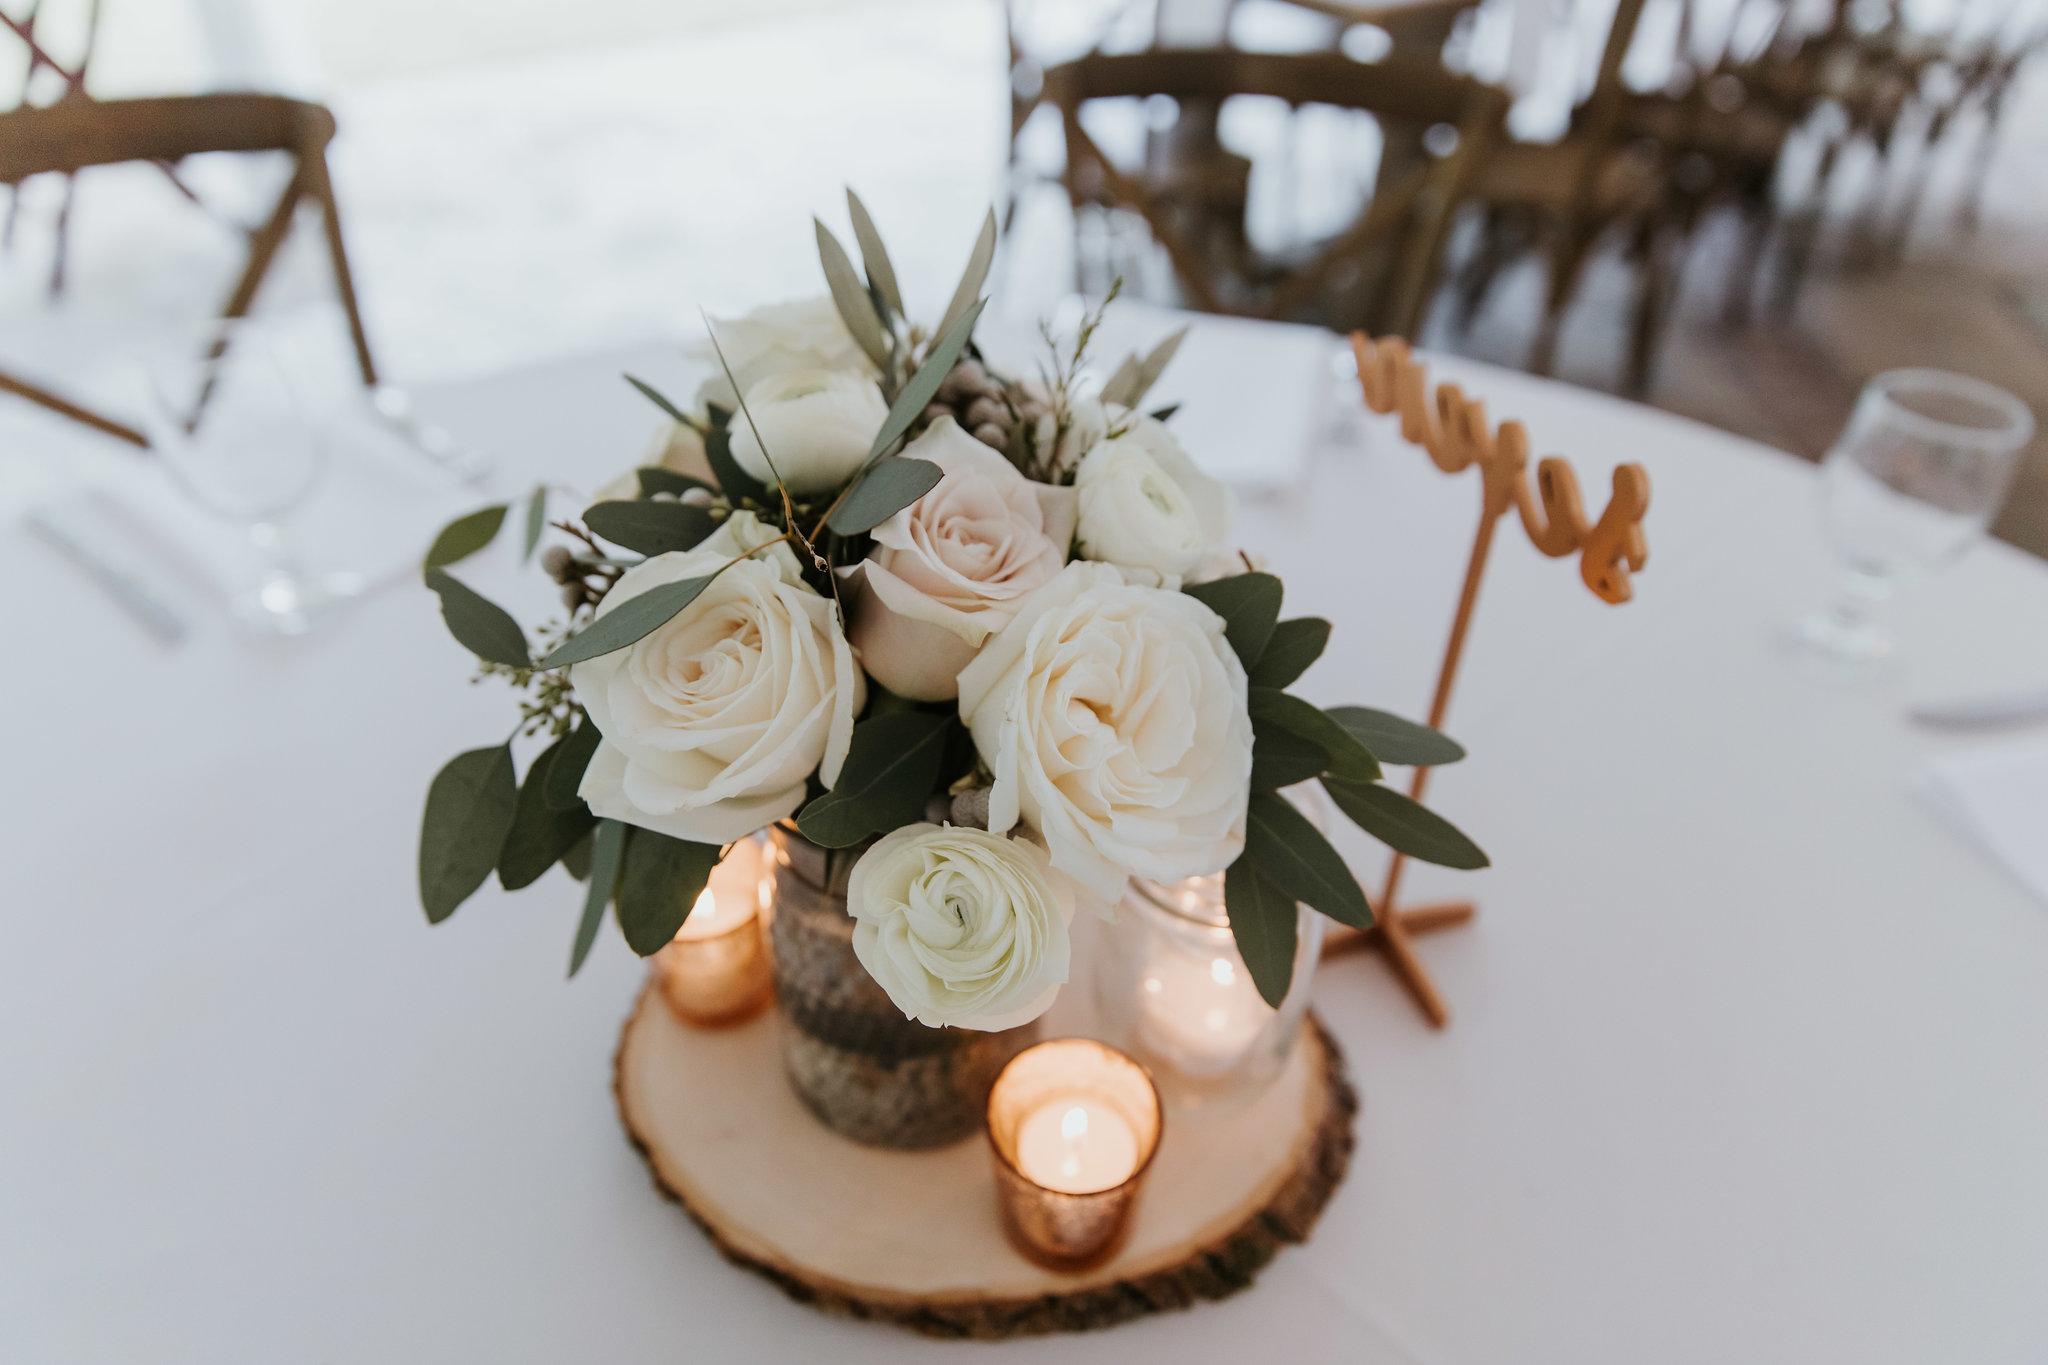 Legare-Waring-House-Charleston-SC-wedding-portrait-photography-434.jpg